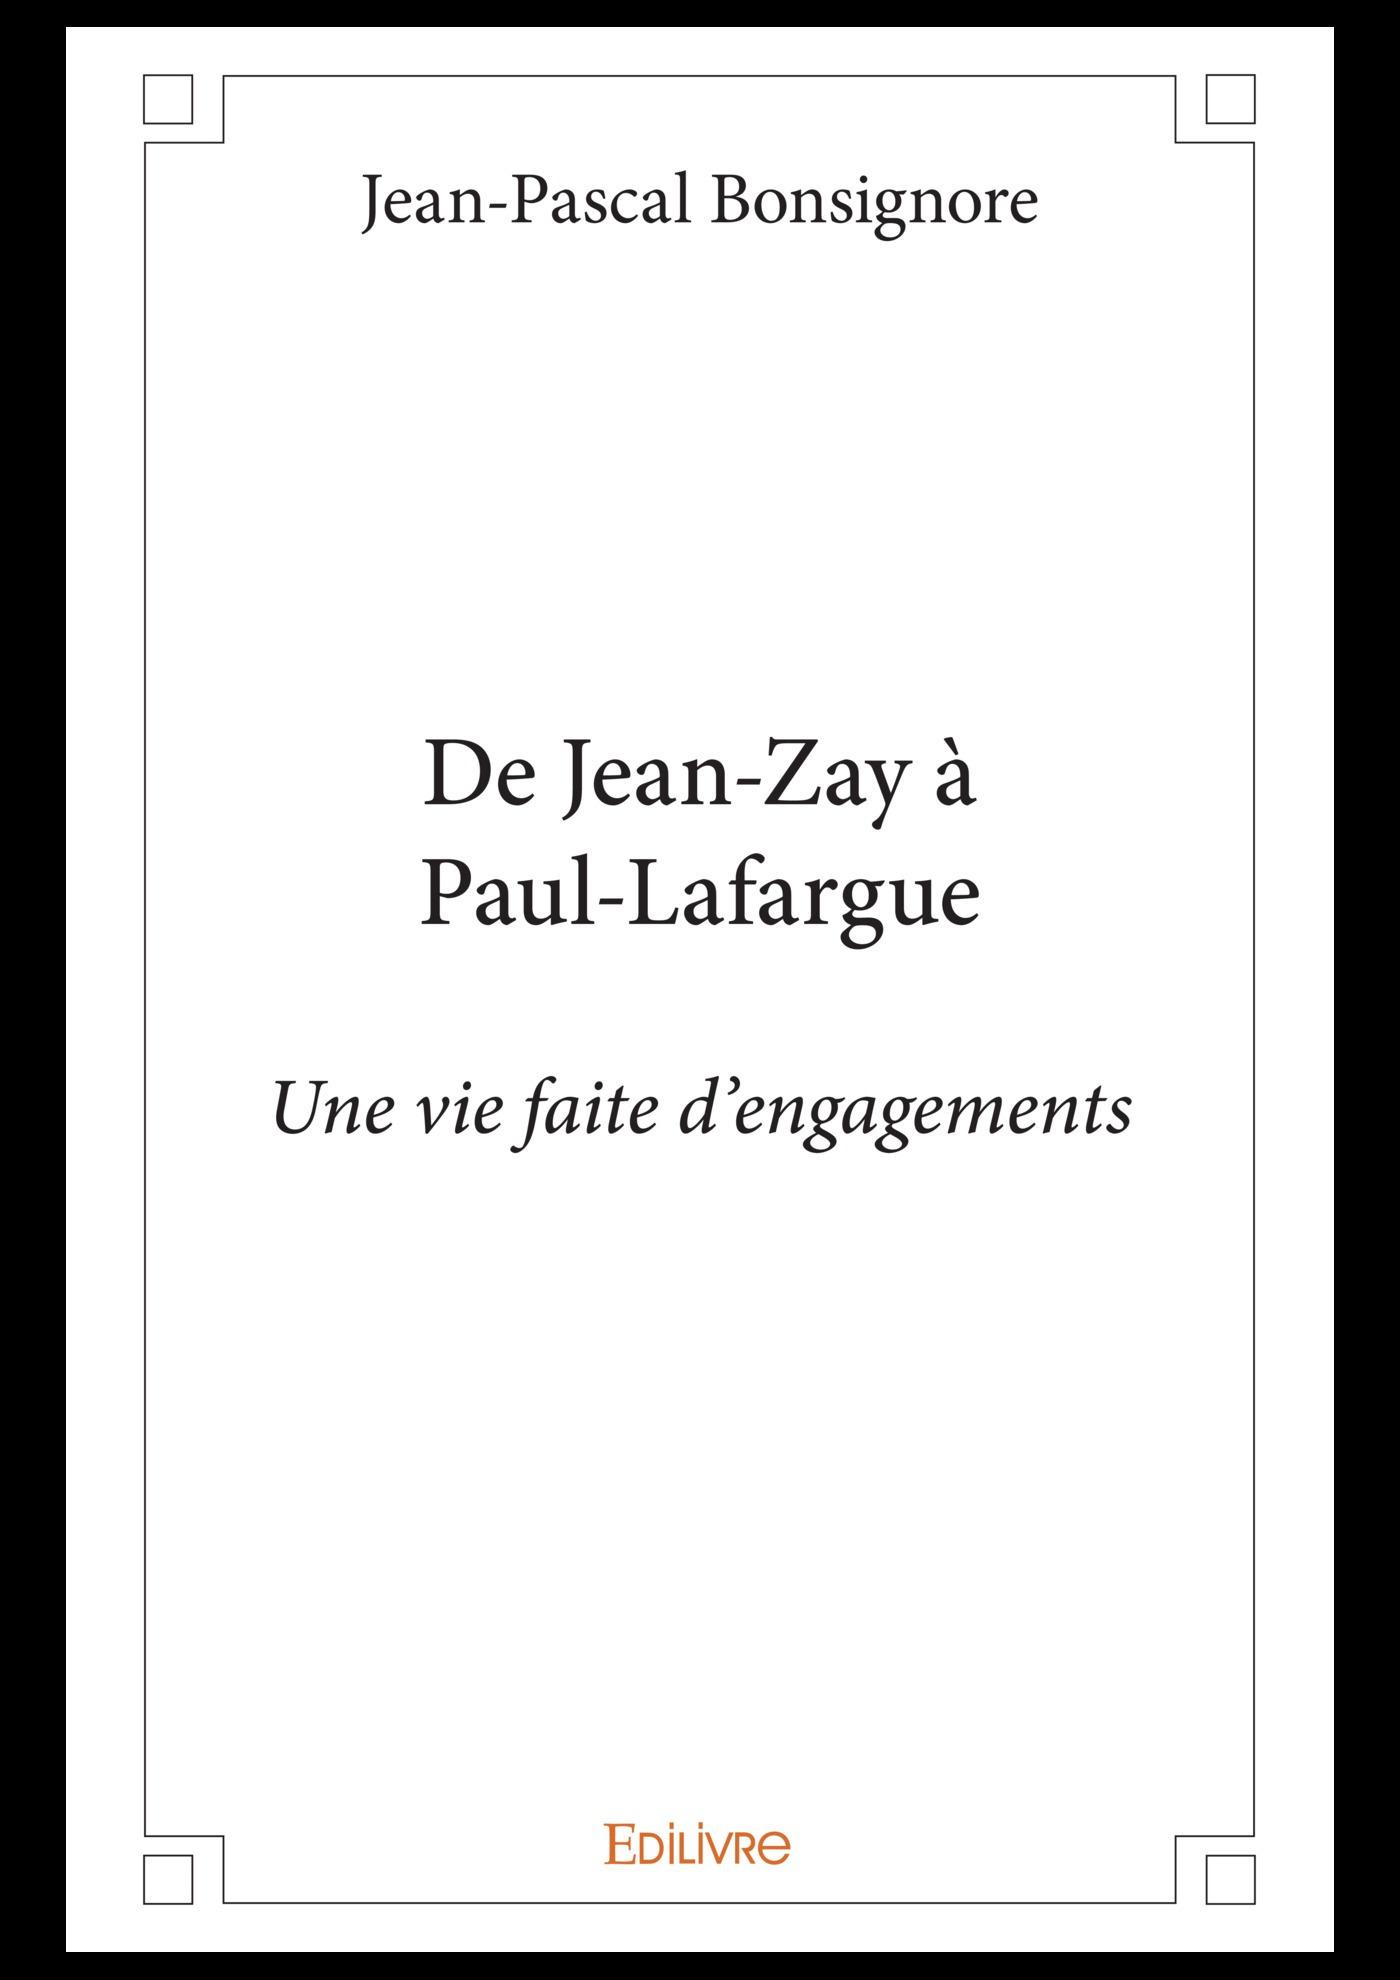 De jean-zay a paul-lafargue